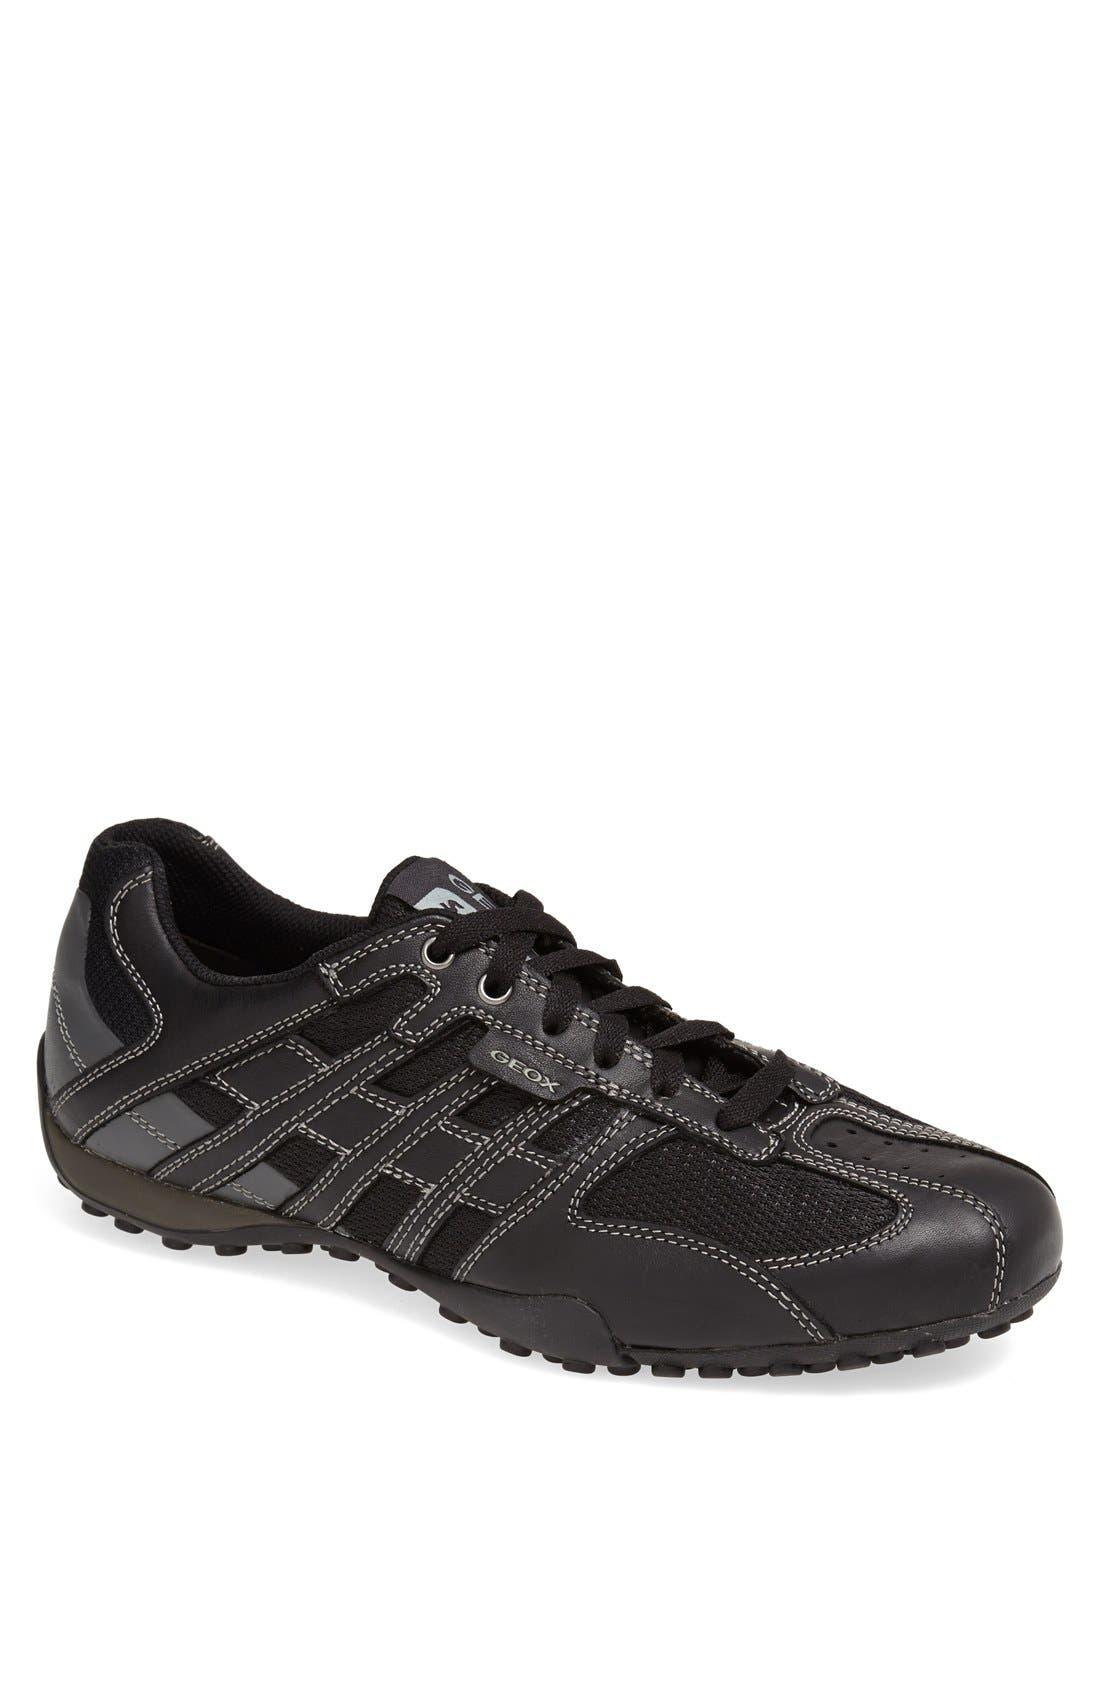 'Snake 95' Sneaker,                         Main,                         color, BLACK/ LEAD